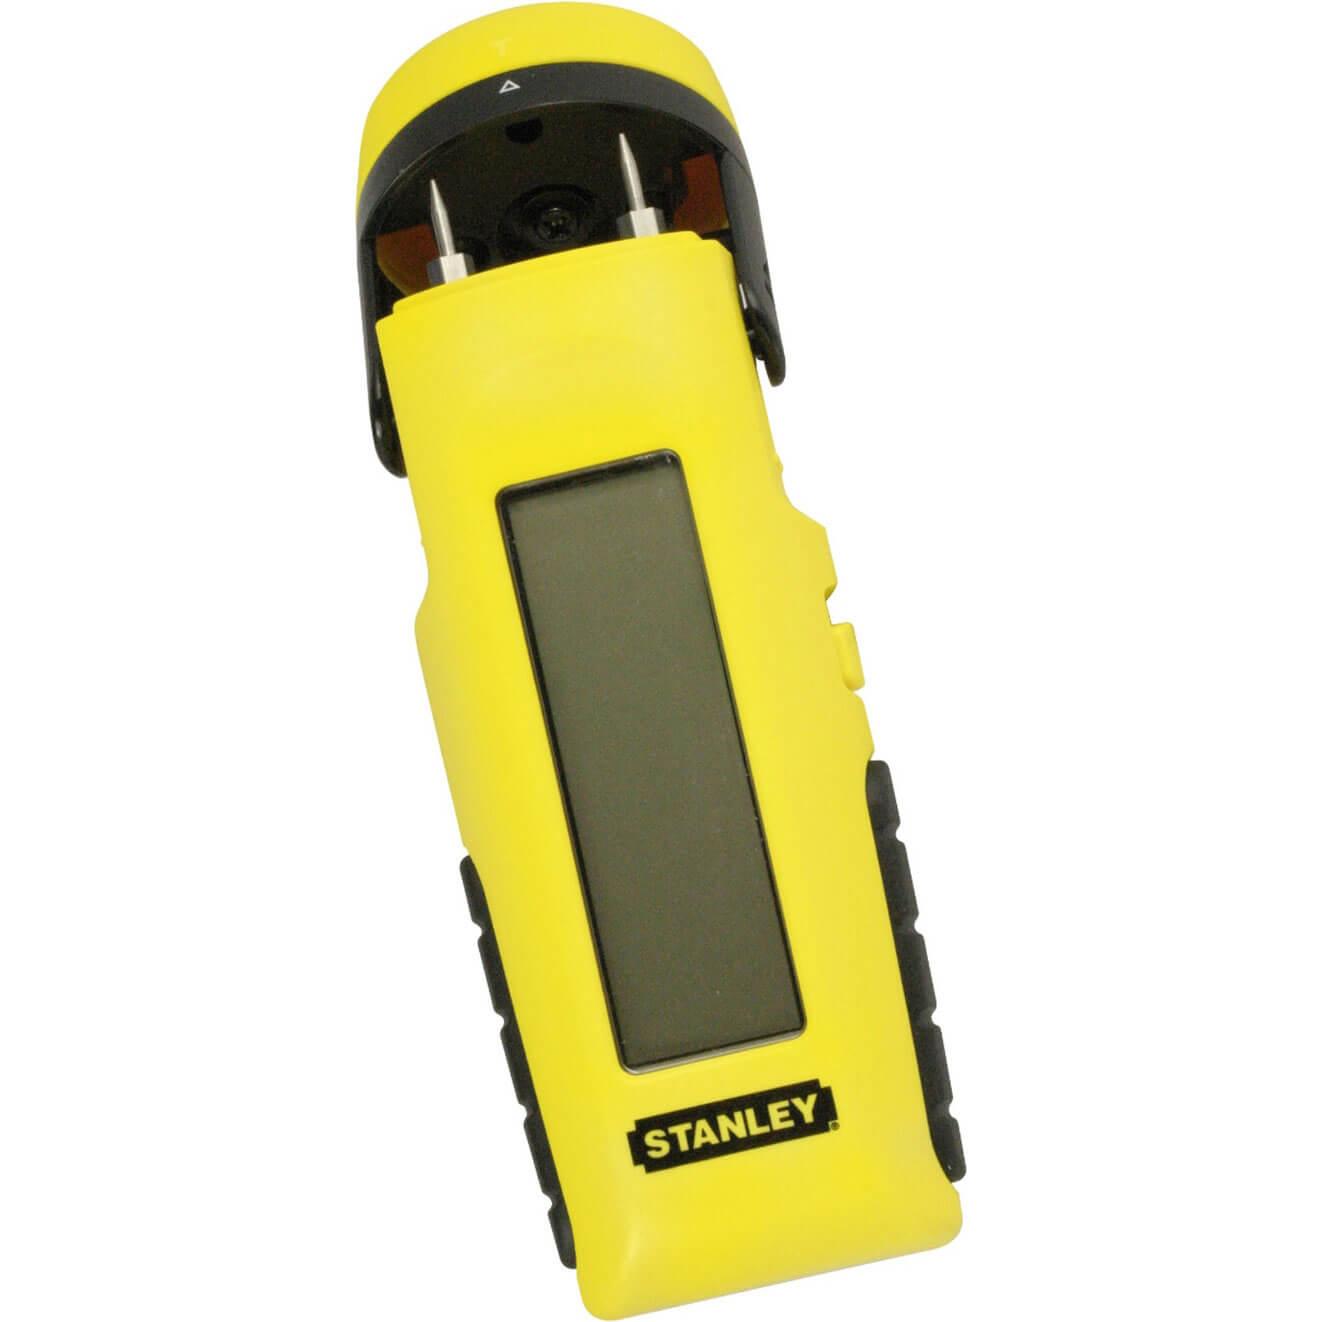 Stanley Intellilevel LCD Moisture and Damp Meter